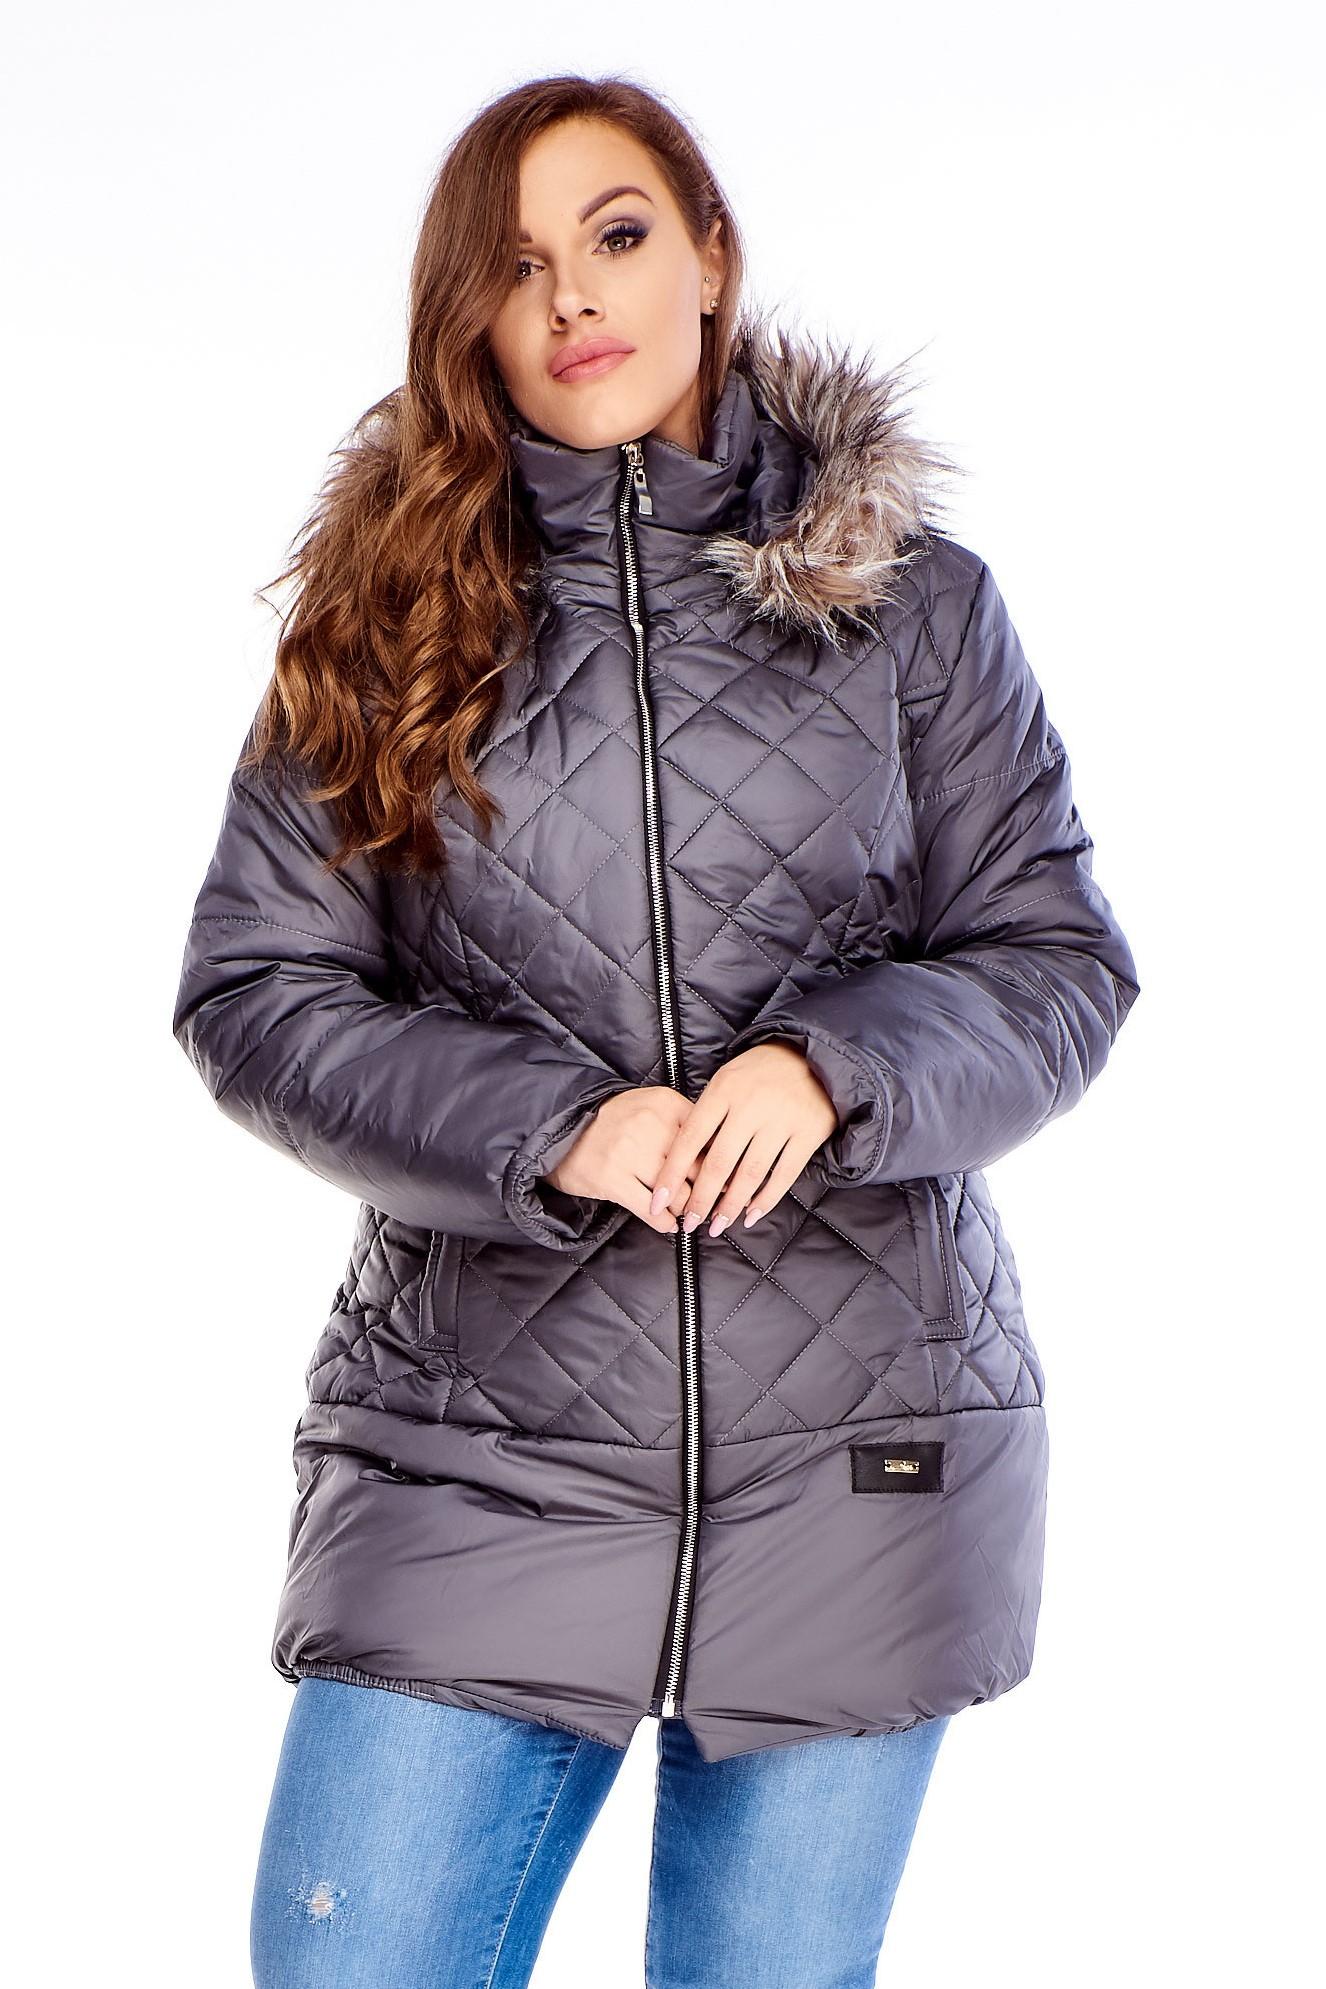 Sivá zimná bunda s kožušinkou - 38